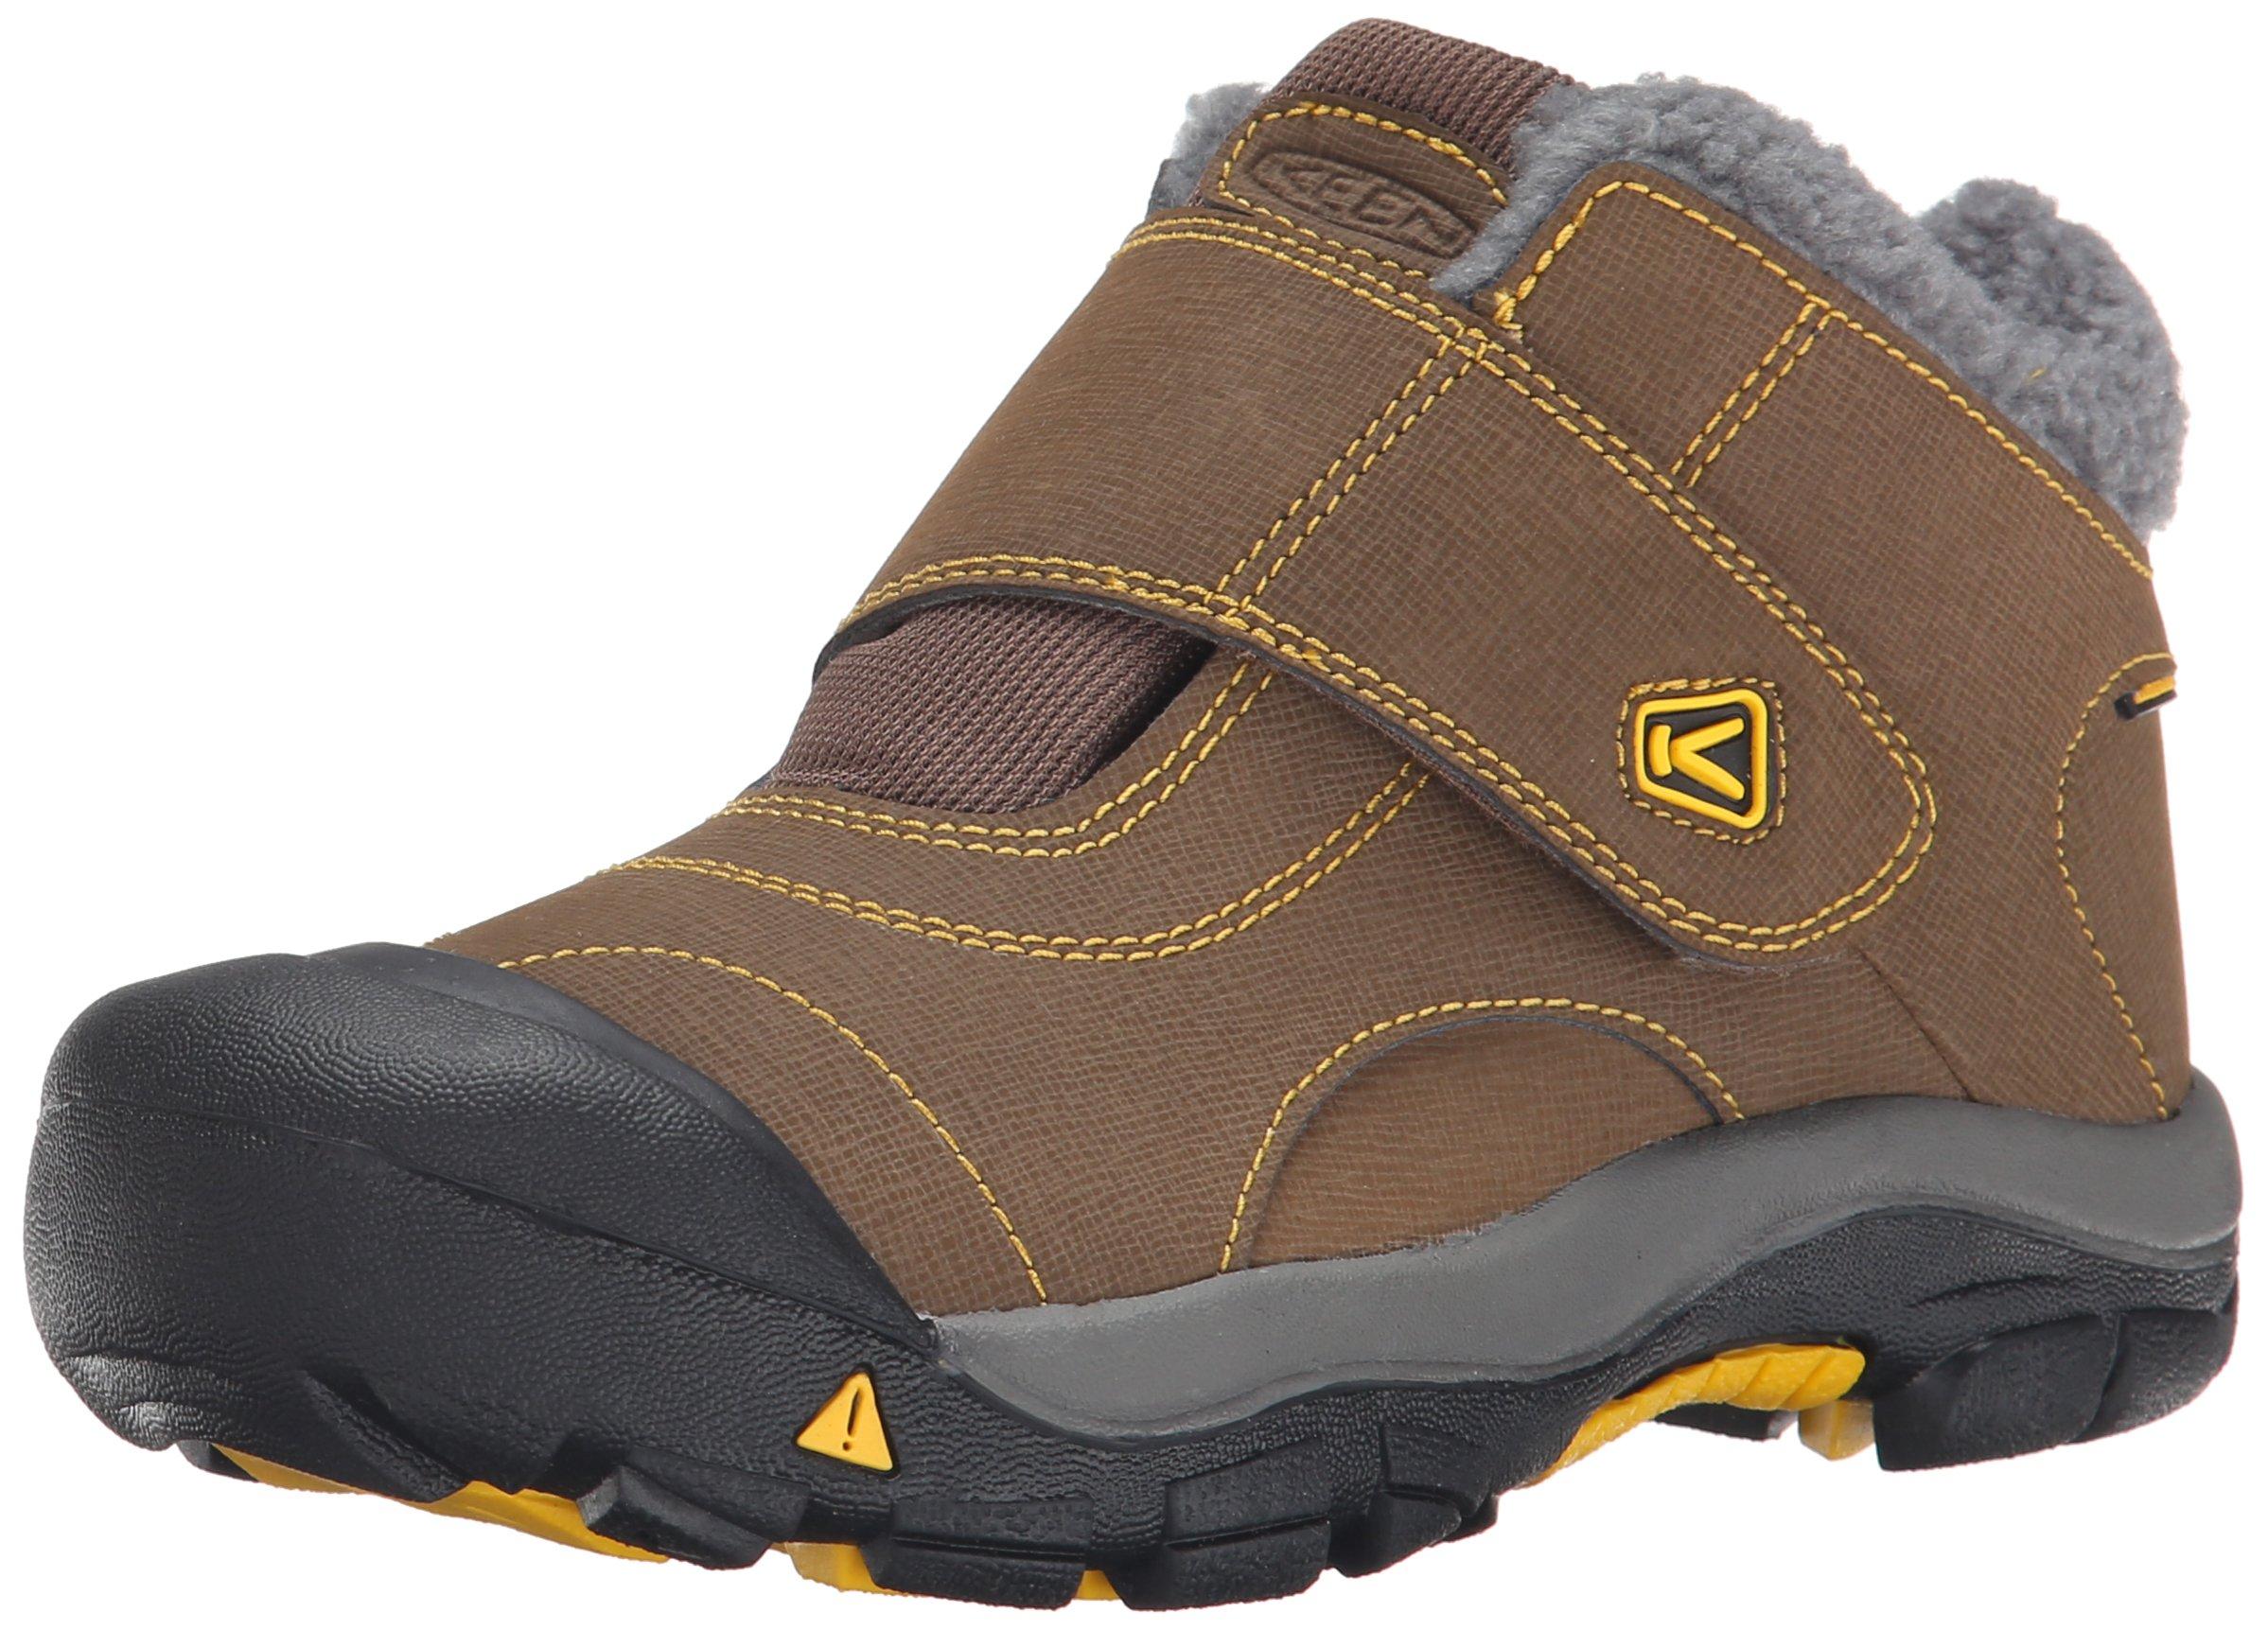 KEEN Kootenay Waterproof Winter Boot (Little Kid/Big Kid), Dark Earth/Spectra Yellow, 4 M US Big Kid